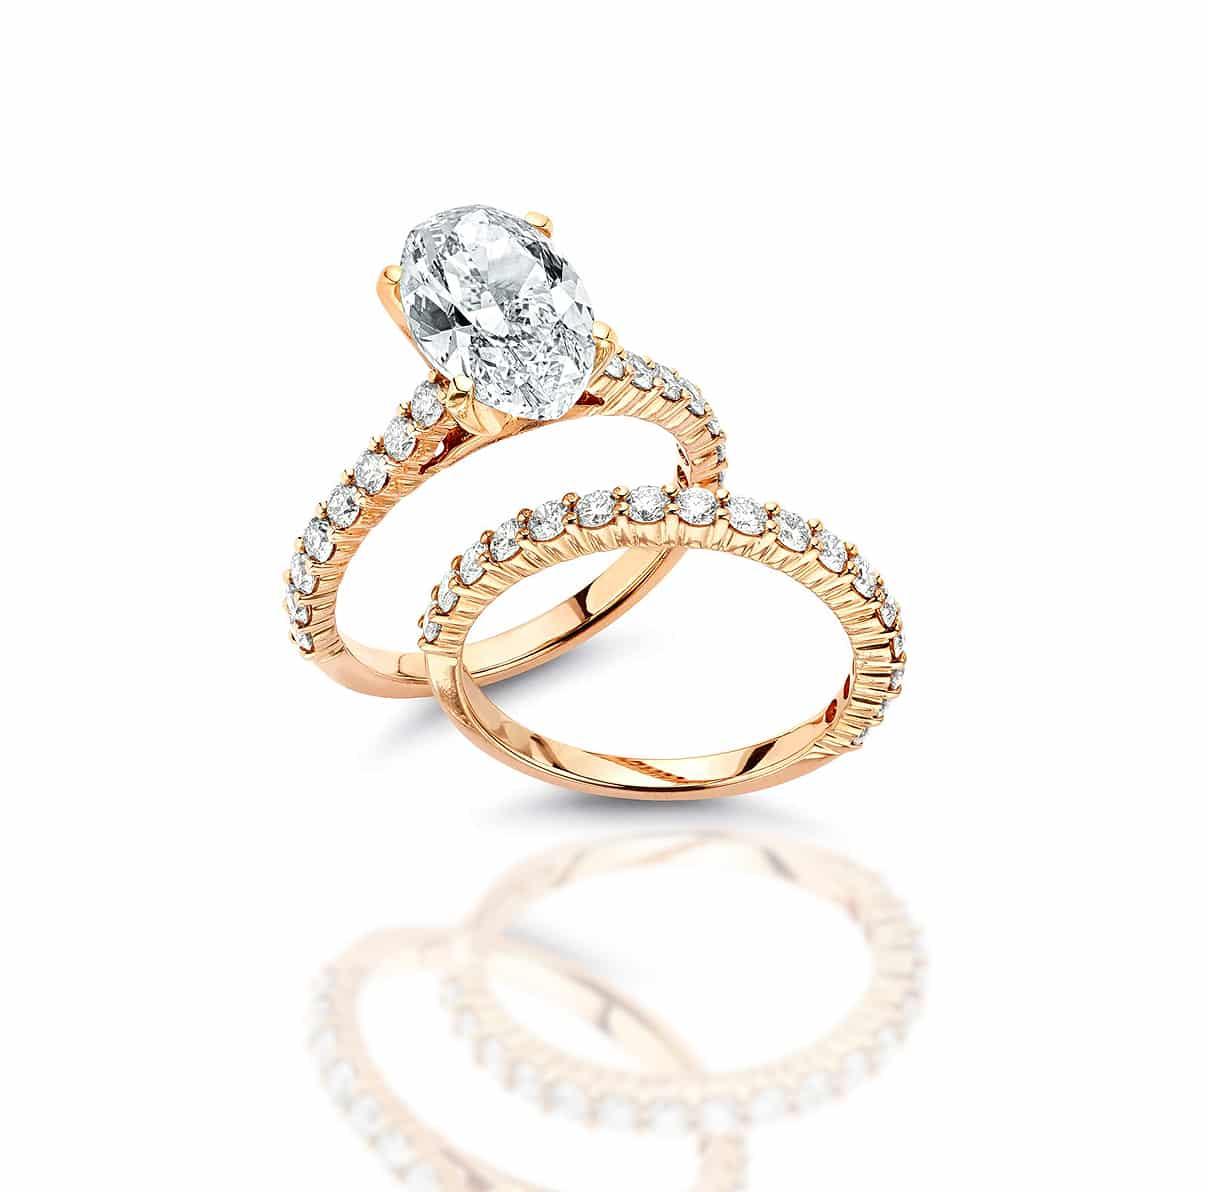 18k rose gold engagement ring set